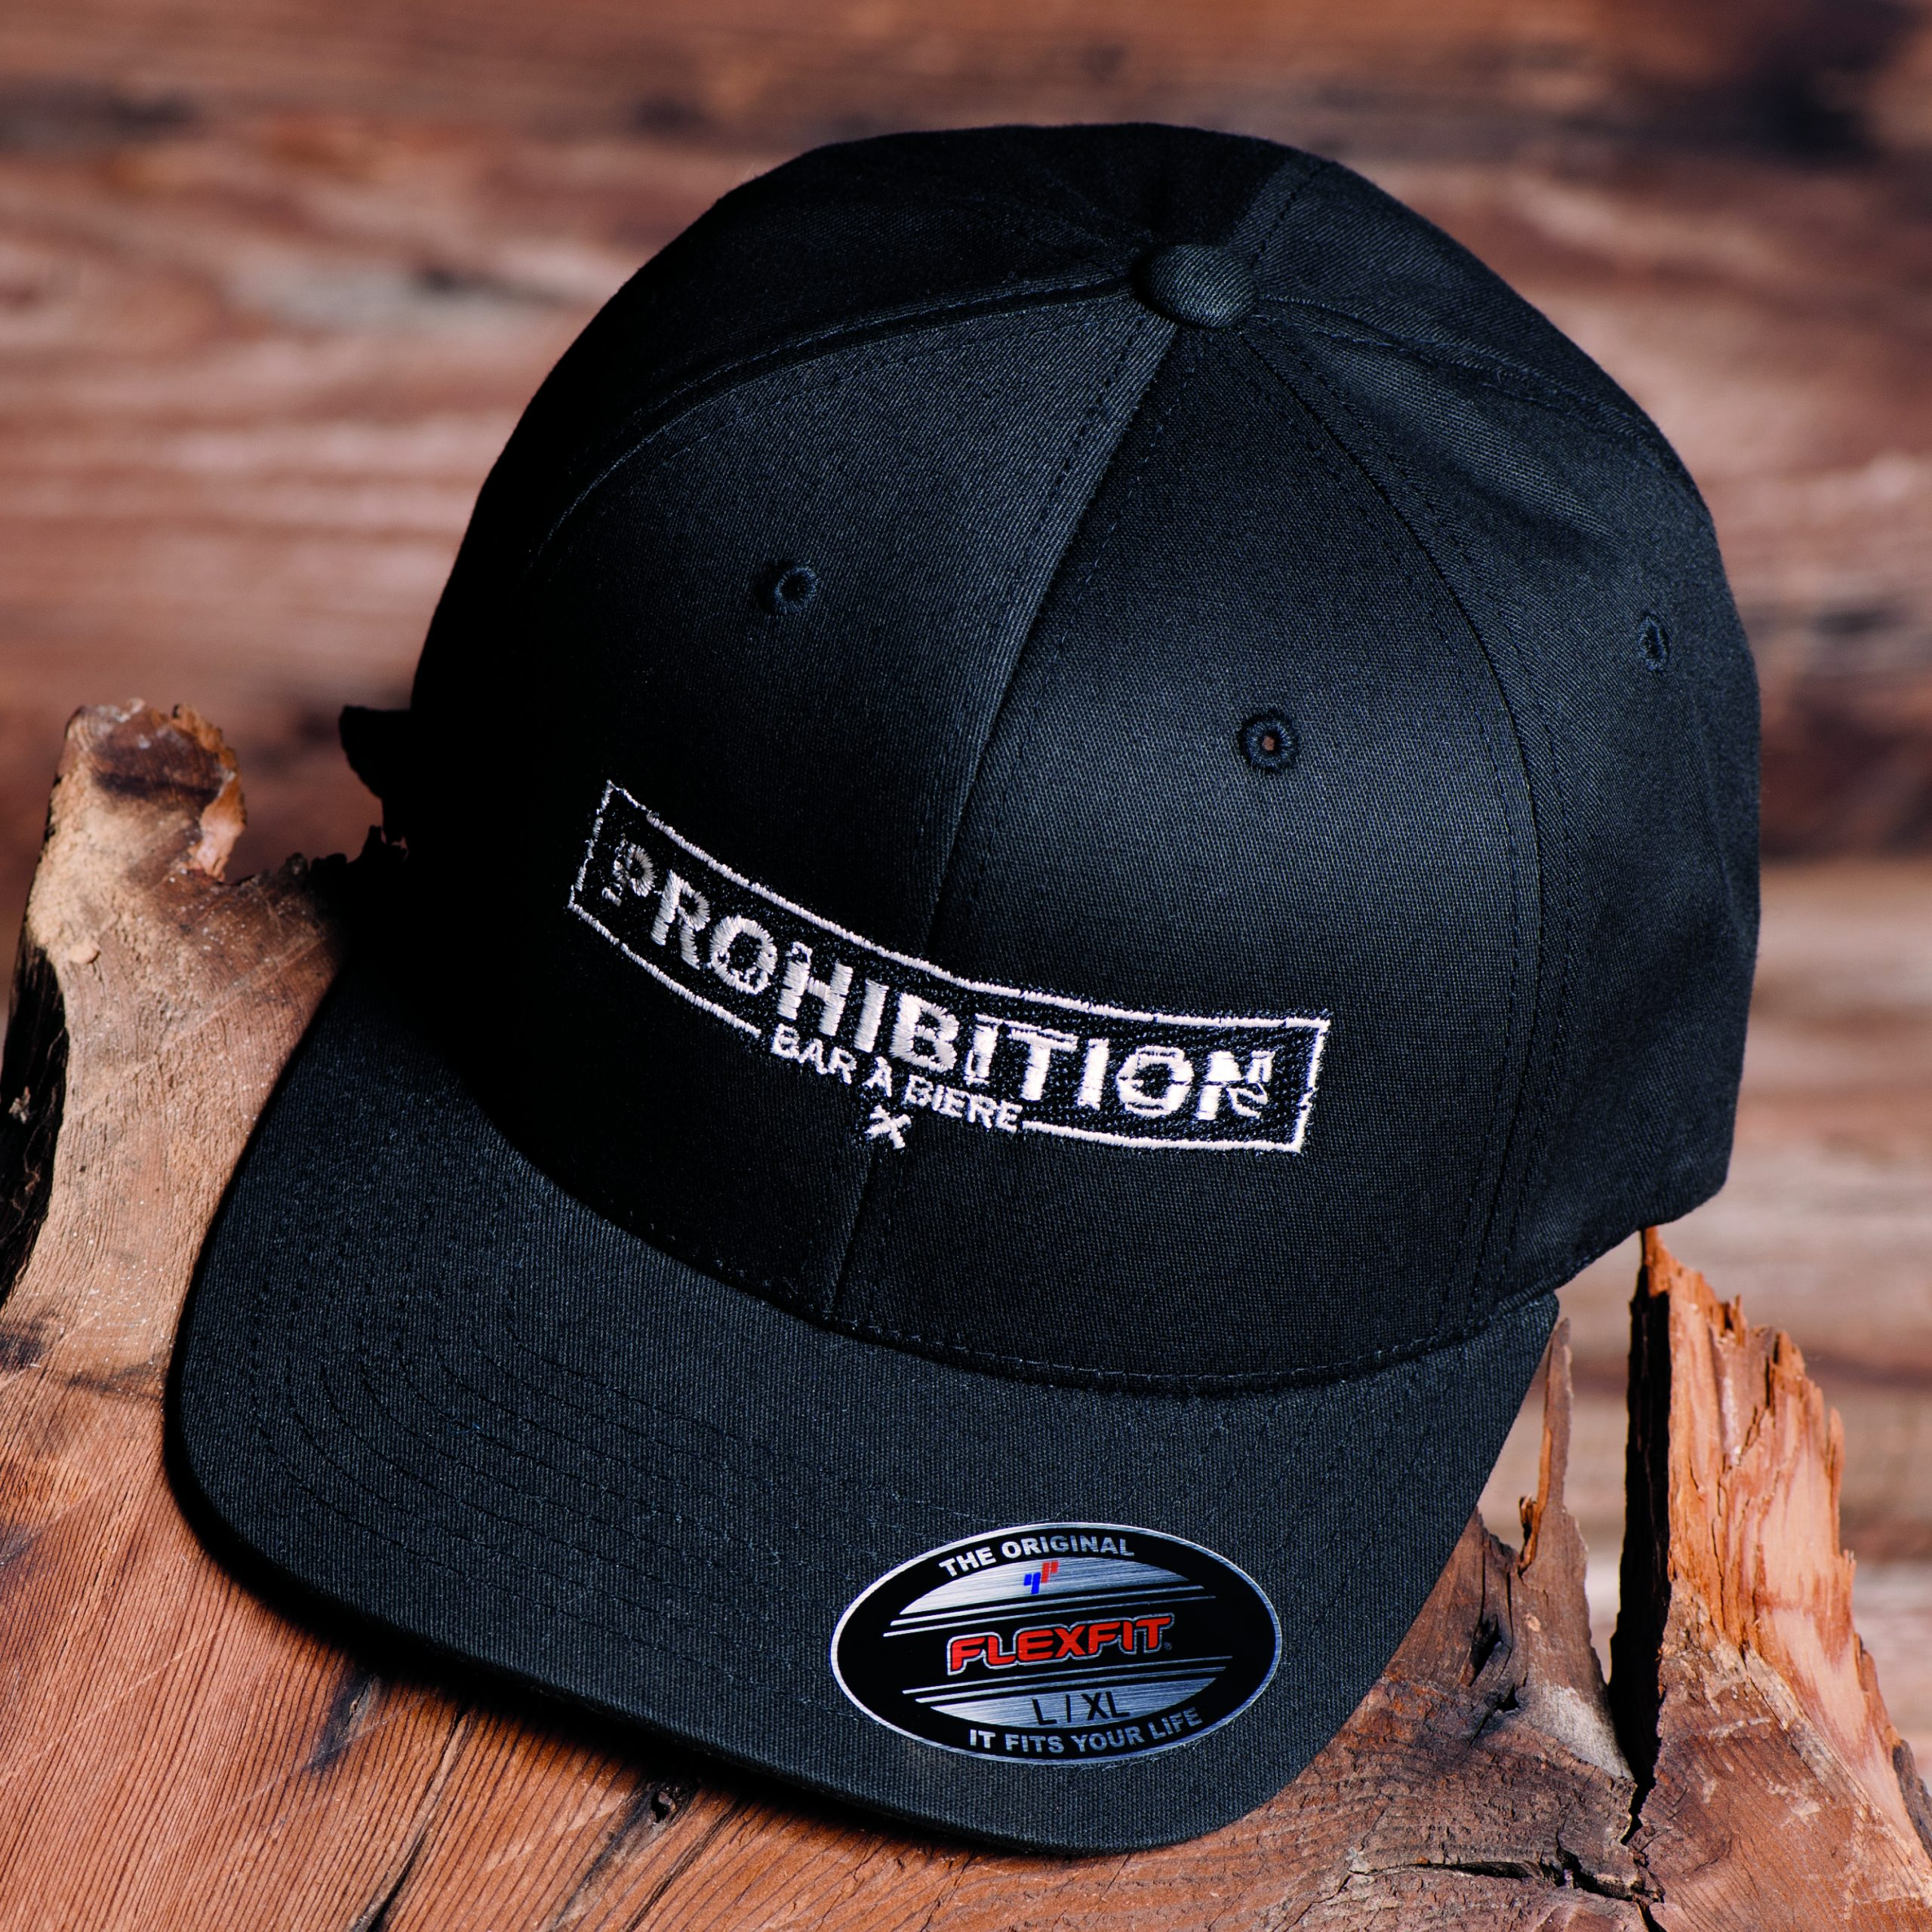 001 Prohibition Highres Cmyk 5